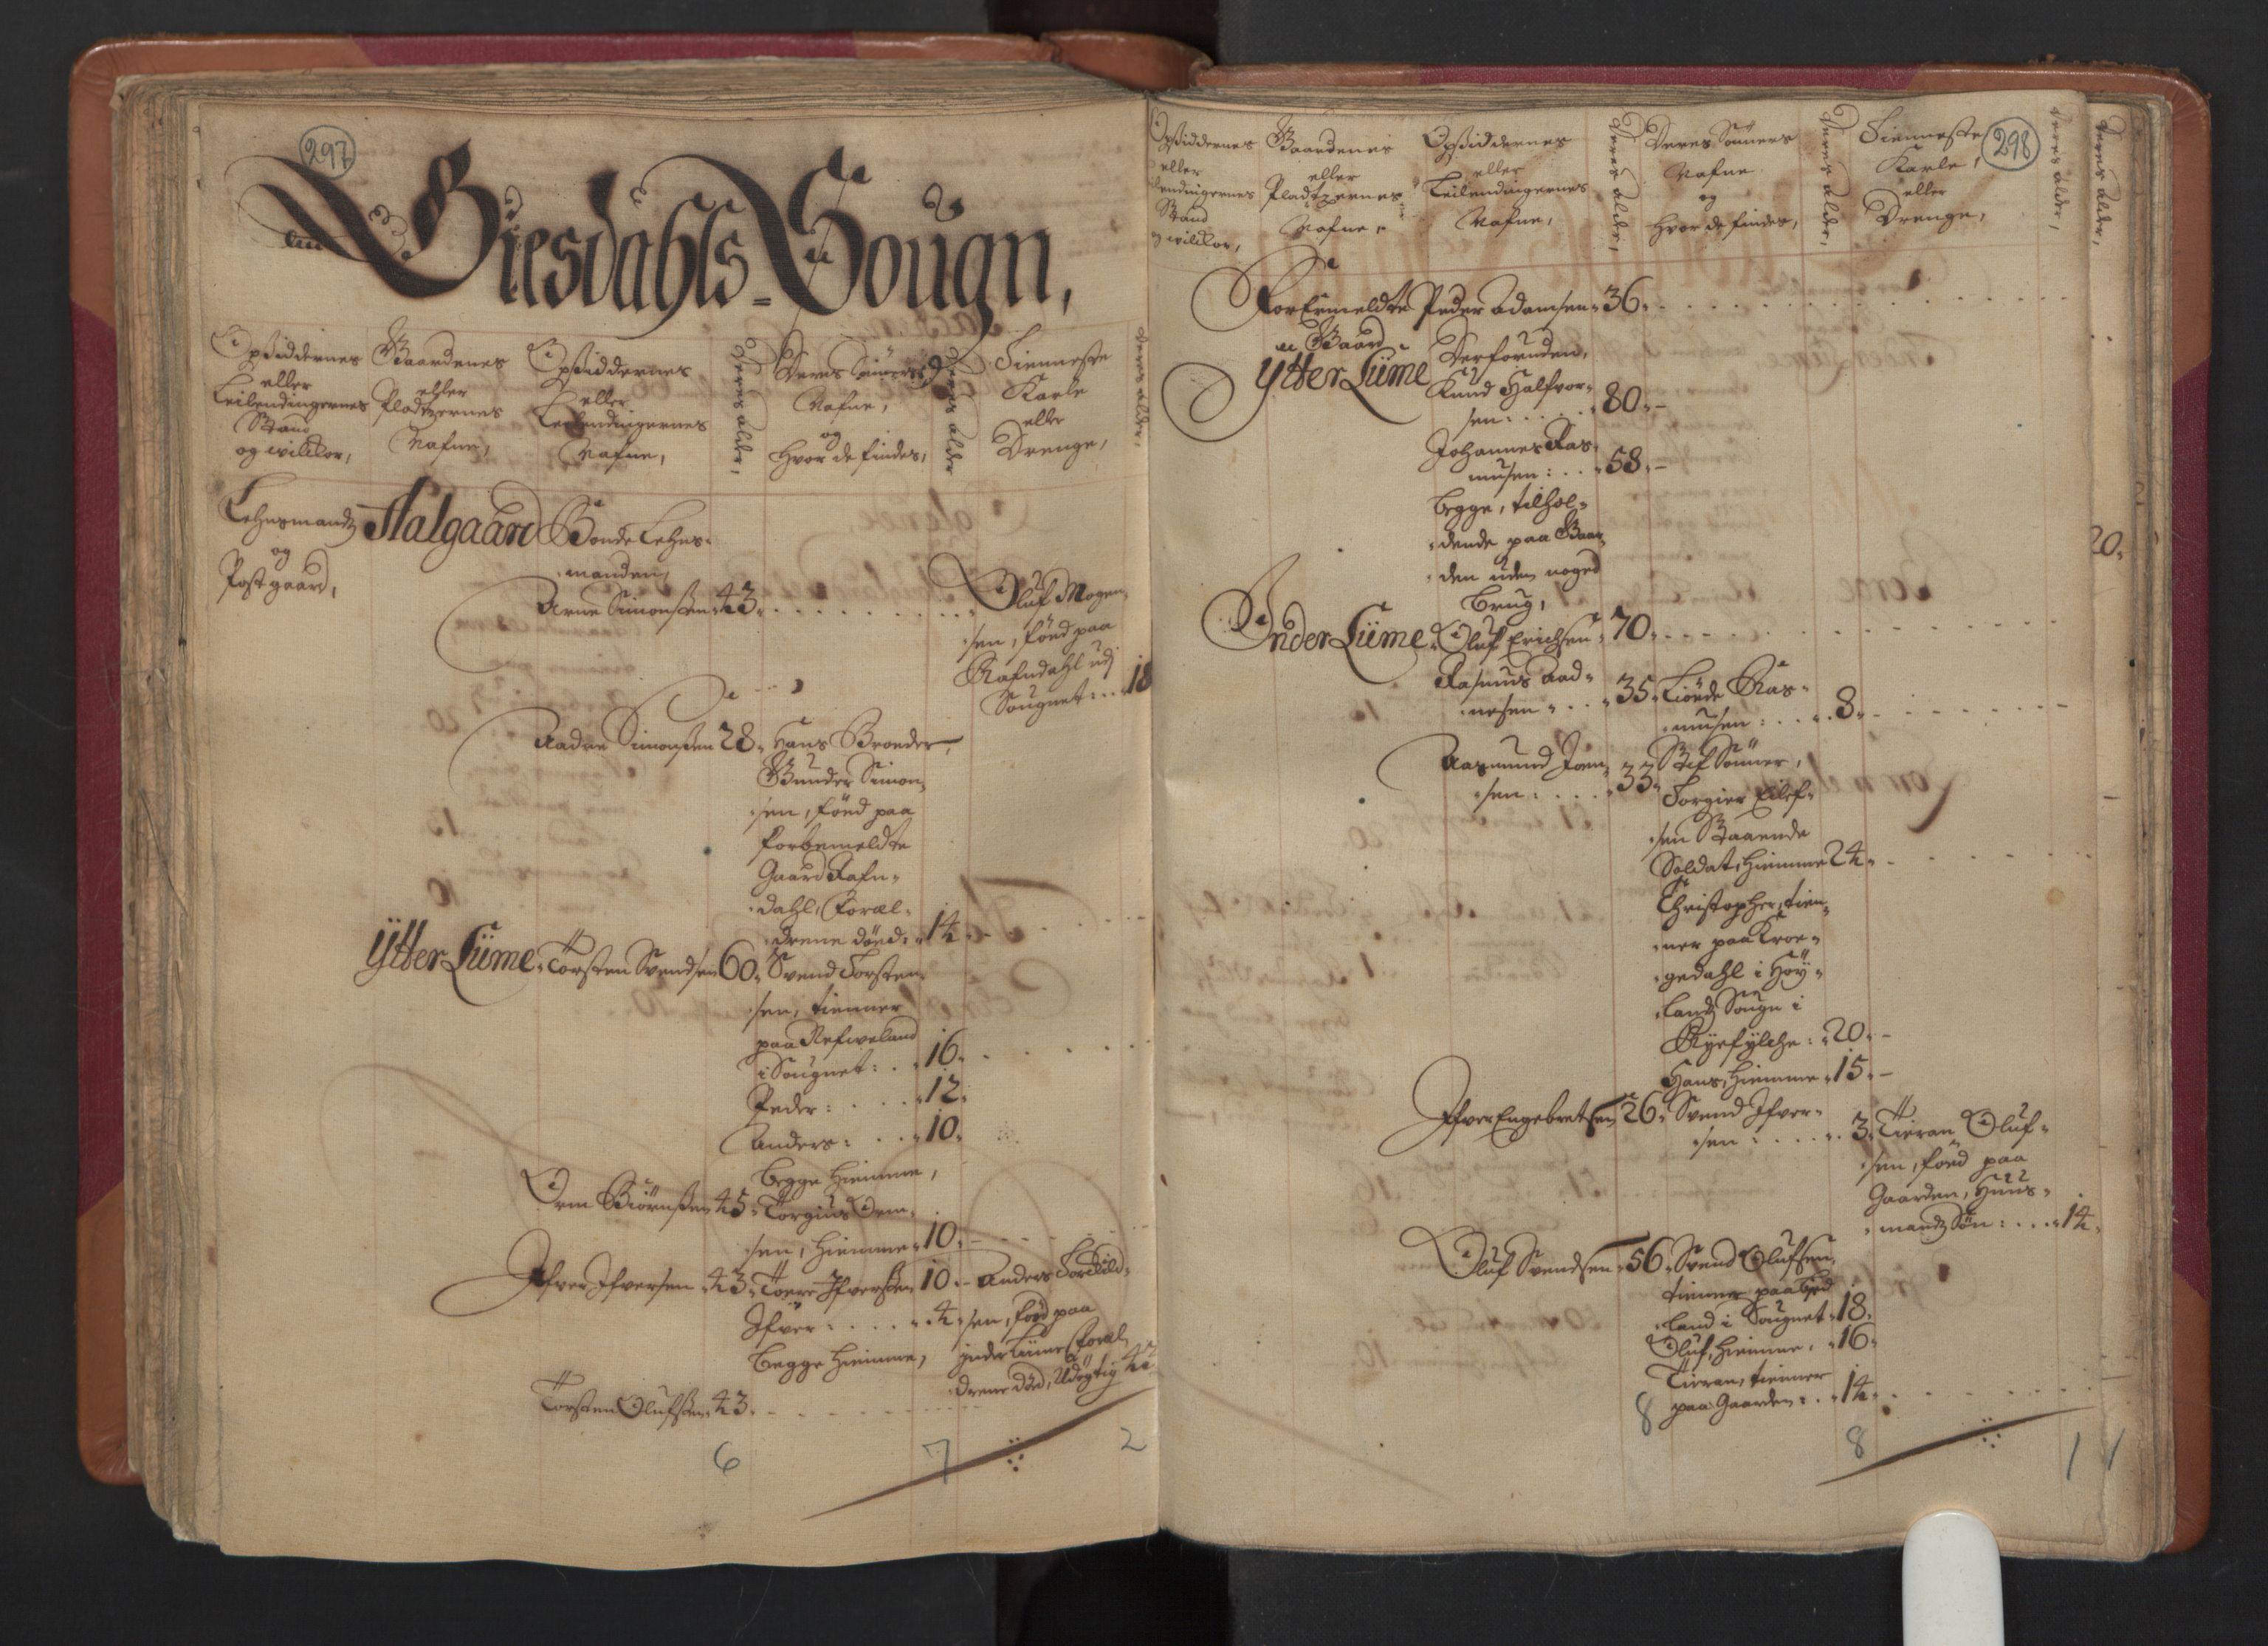 RA, Manntallet 1701, nr. 4: Jæren og Dalane fogderi, 1701, s. 297-298